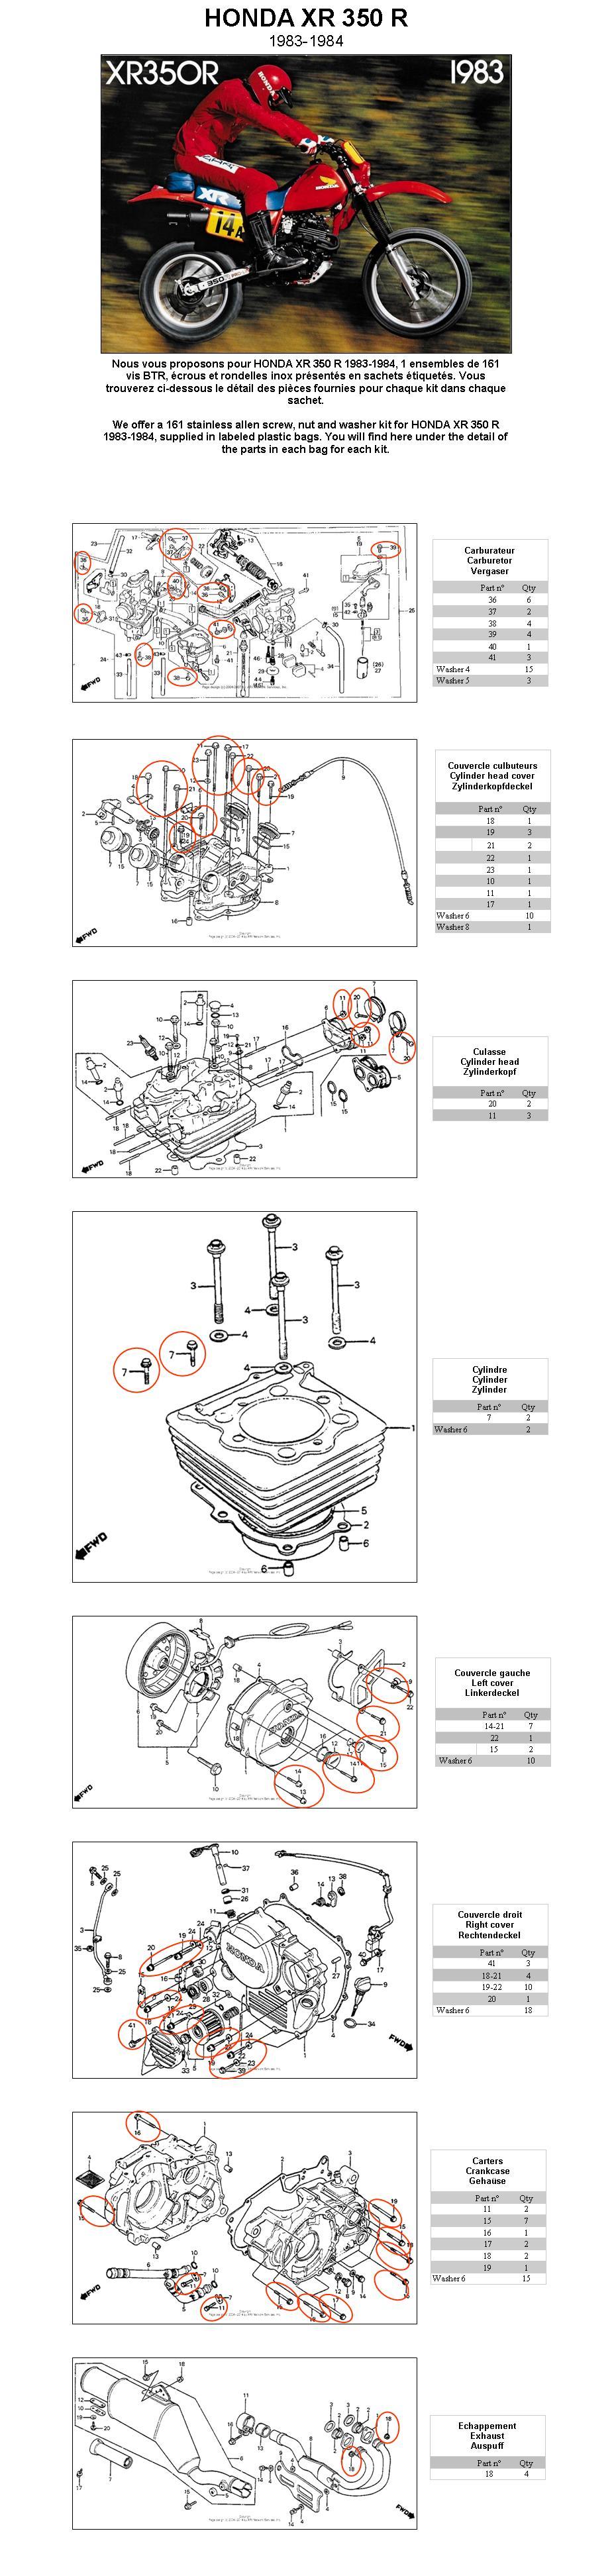 hight resolution of xr350r wiring diagram